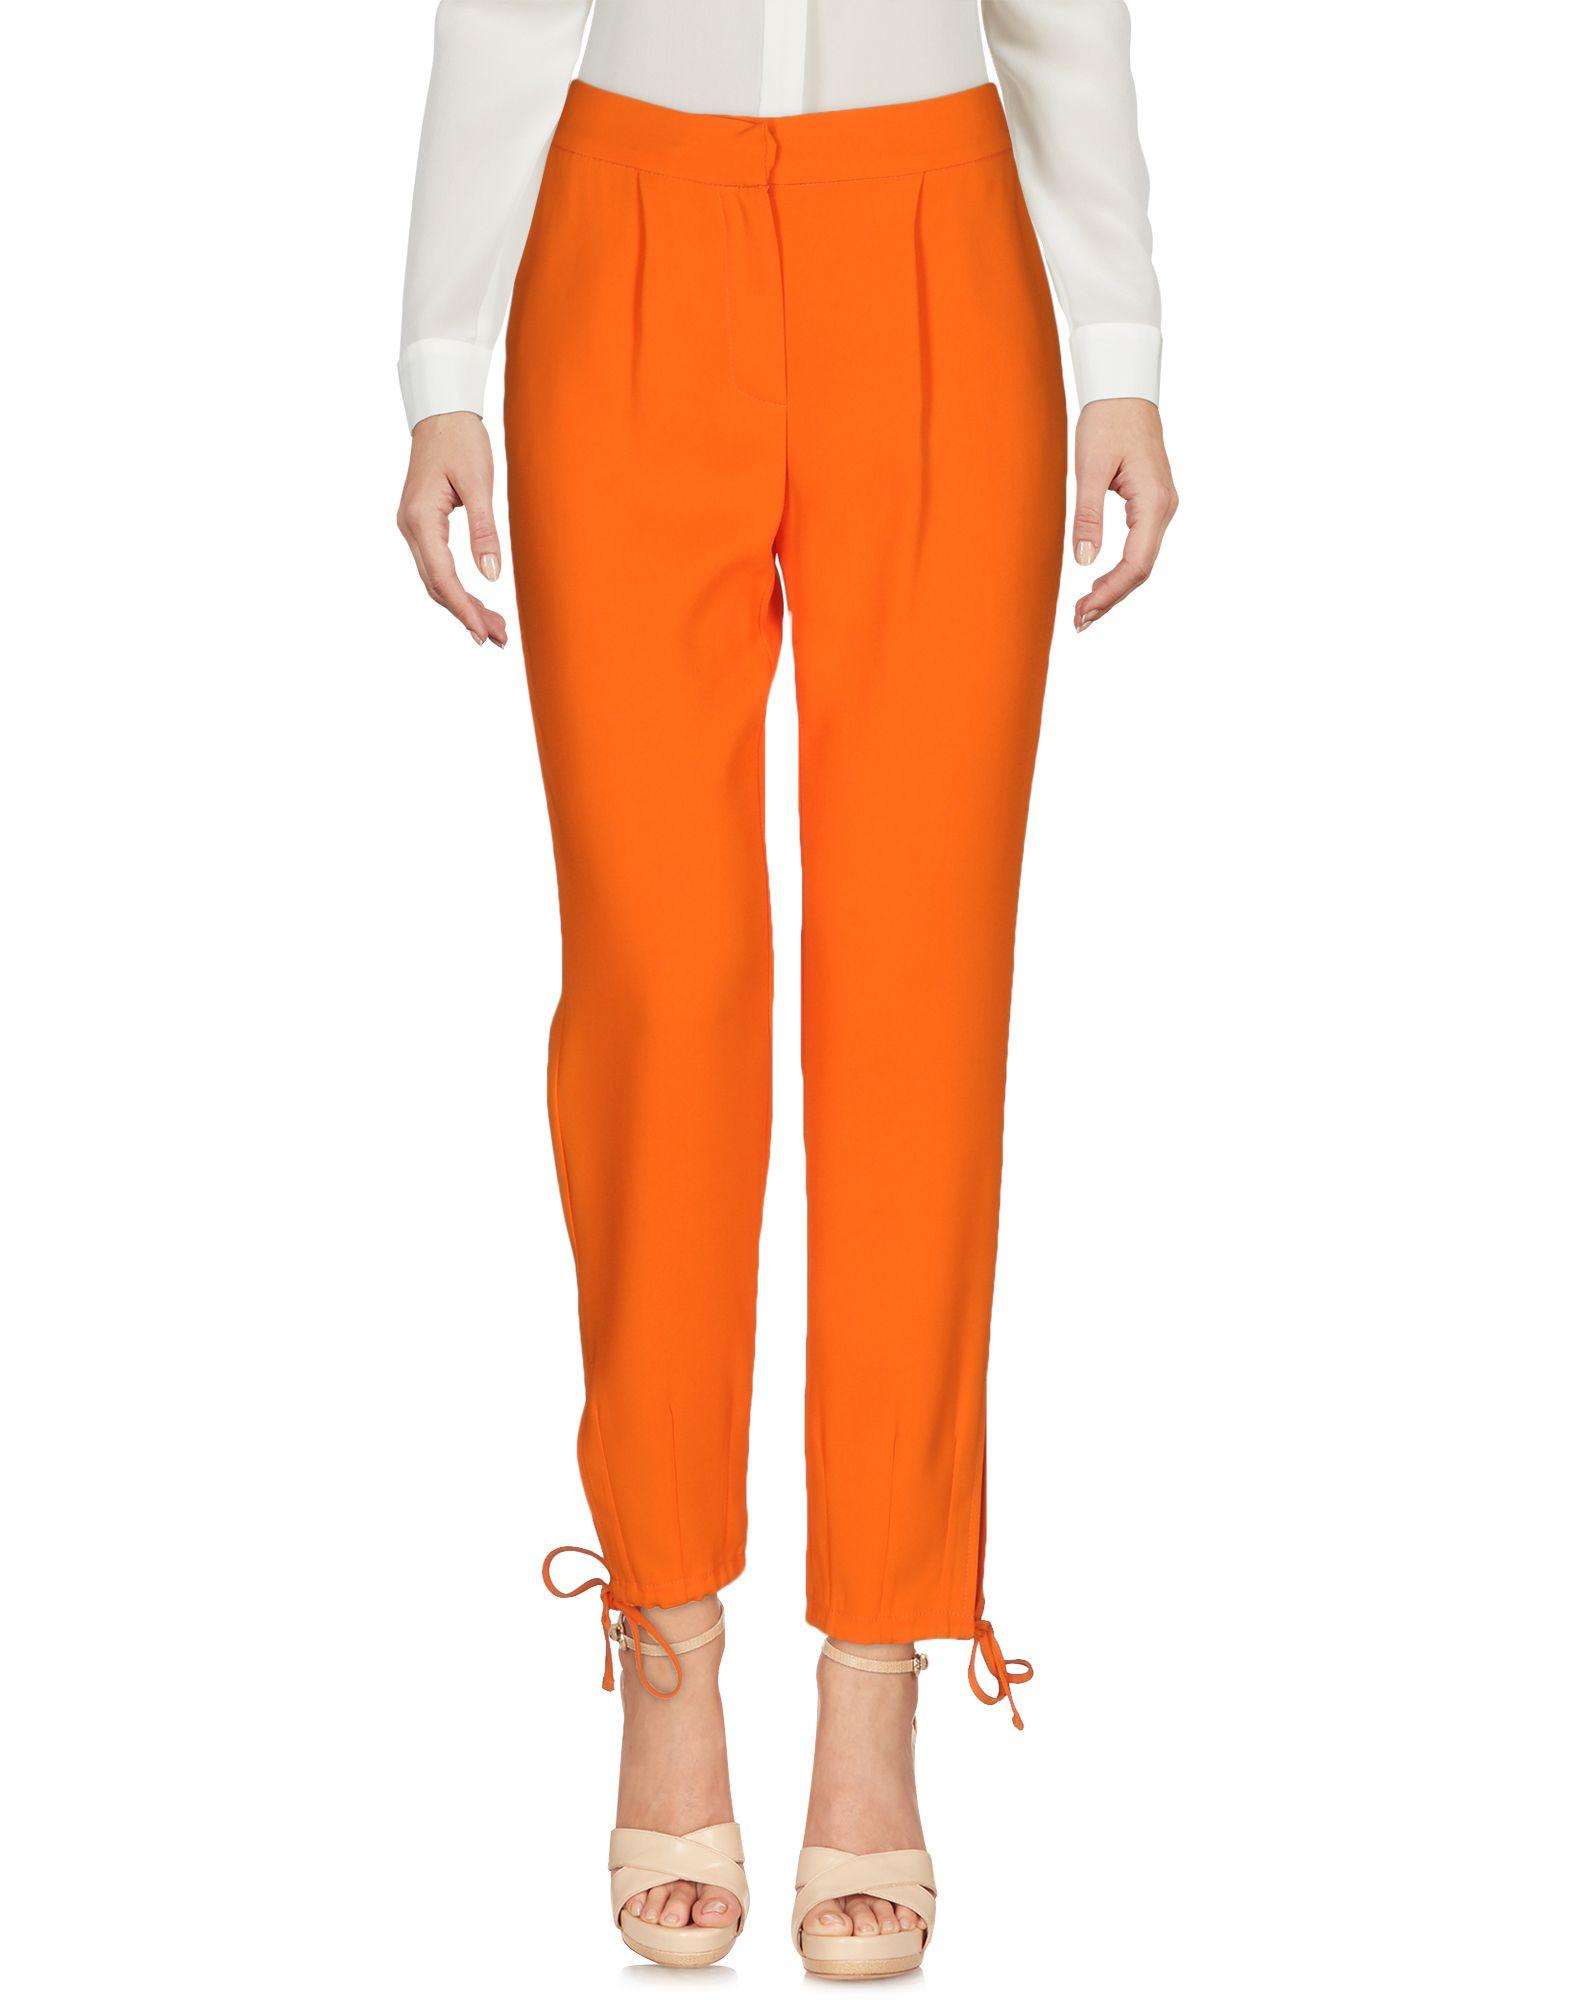 SIMONA CORSELLINI Damen Hose Farbe Orange Größe 3 jetztbilligerkaufen